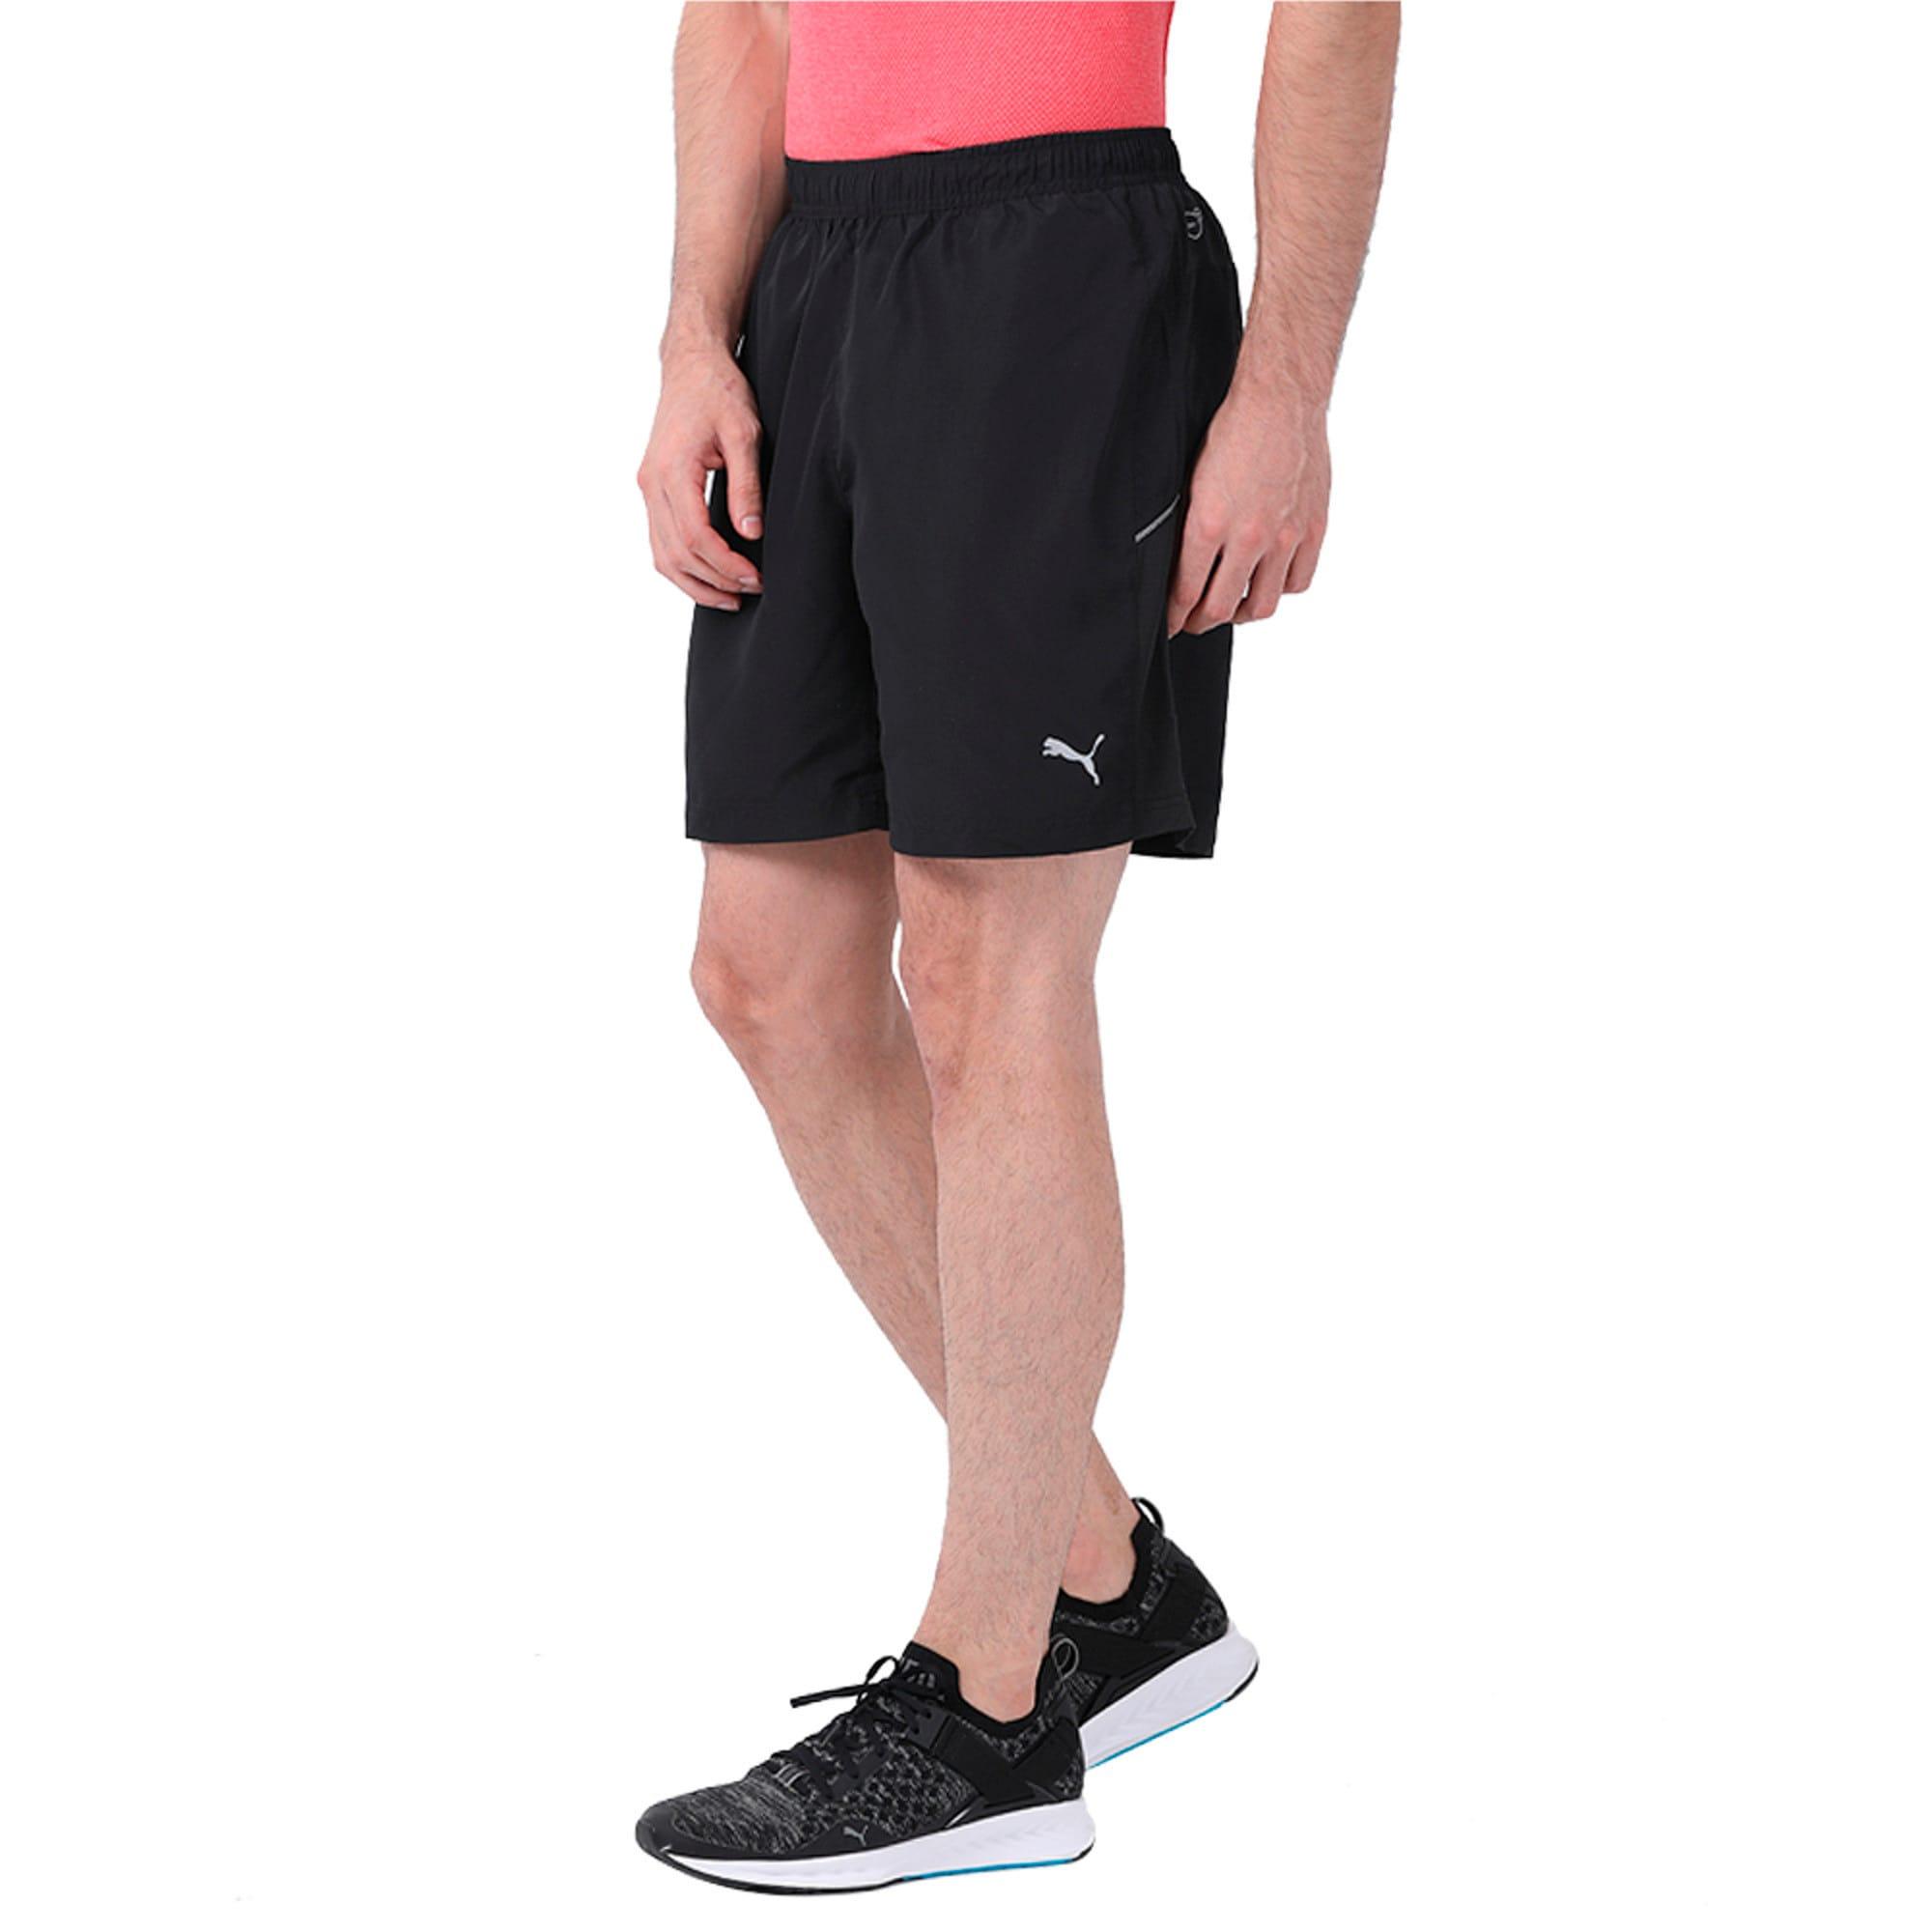 "Thumbnail 3 of Core-Run 7"" Shorts, Puma Black, medium-IND"